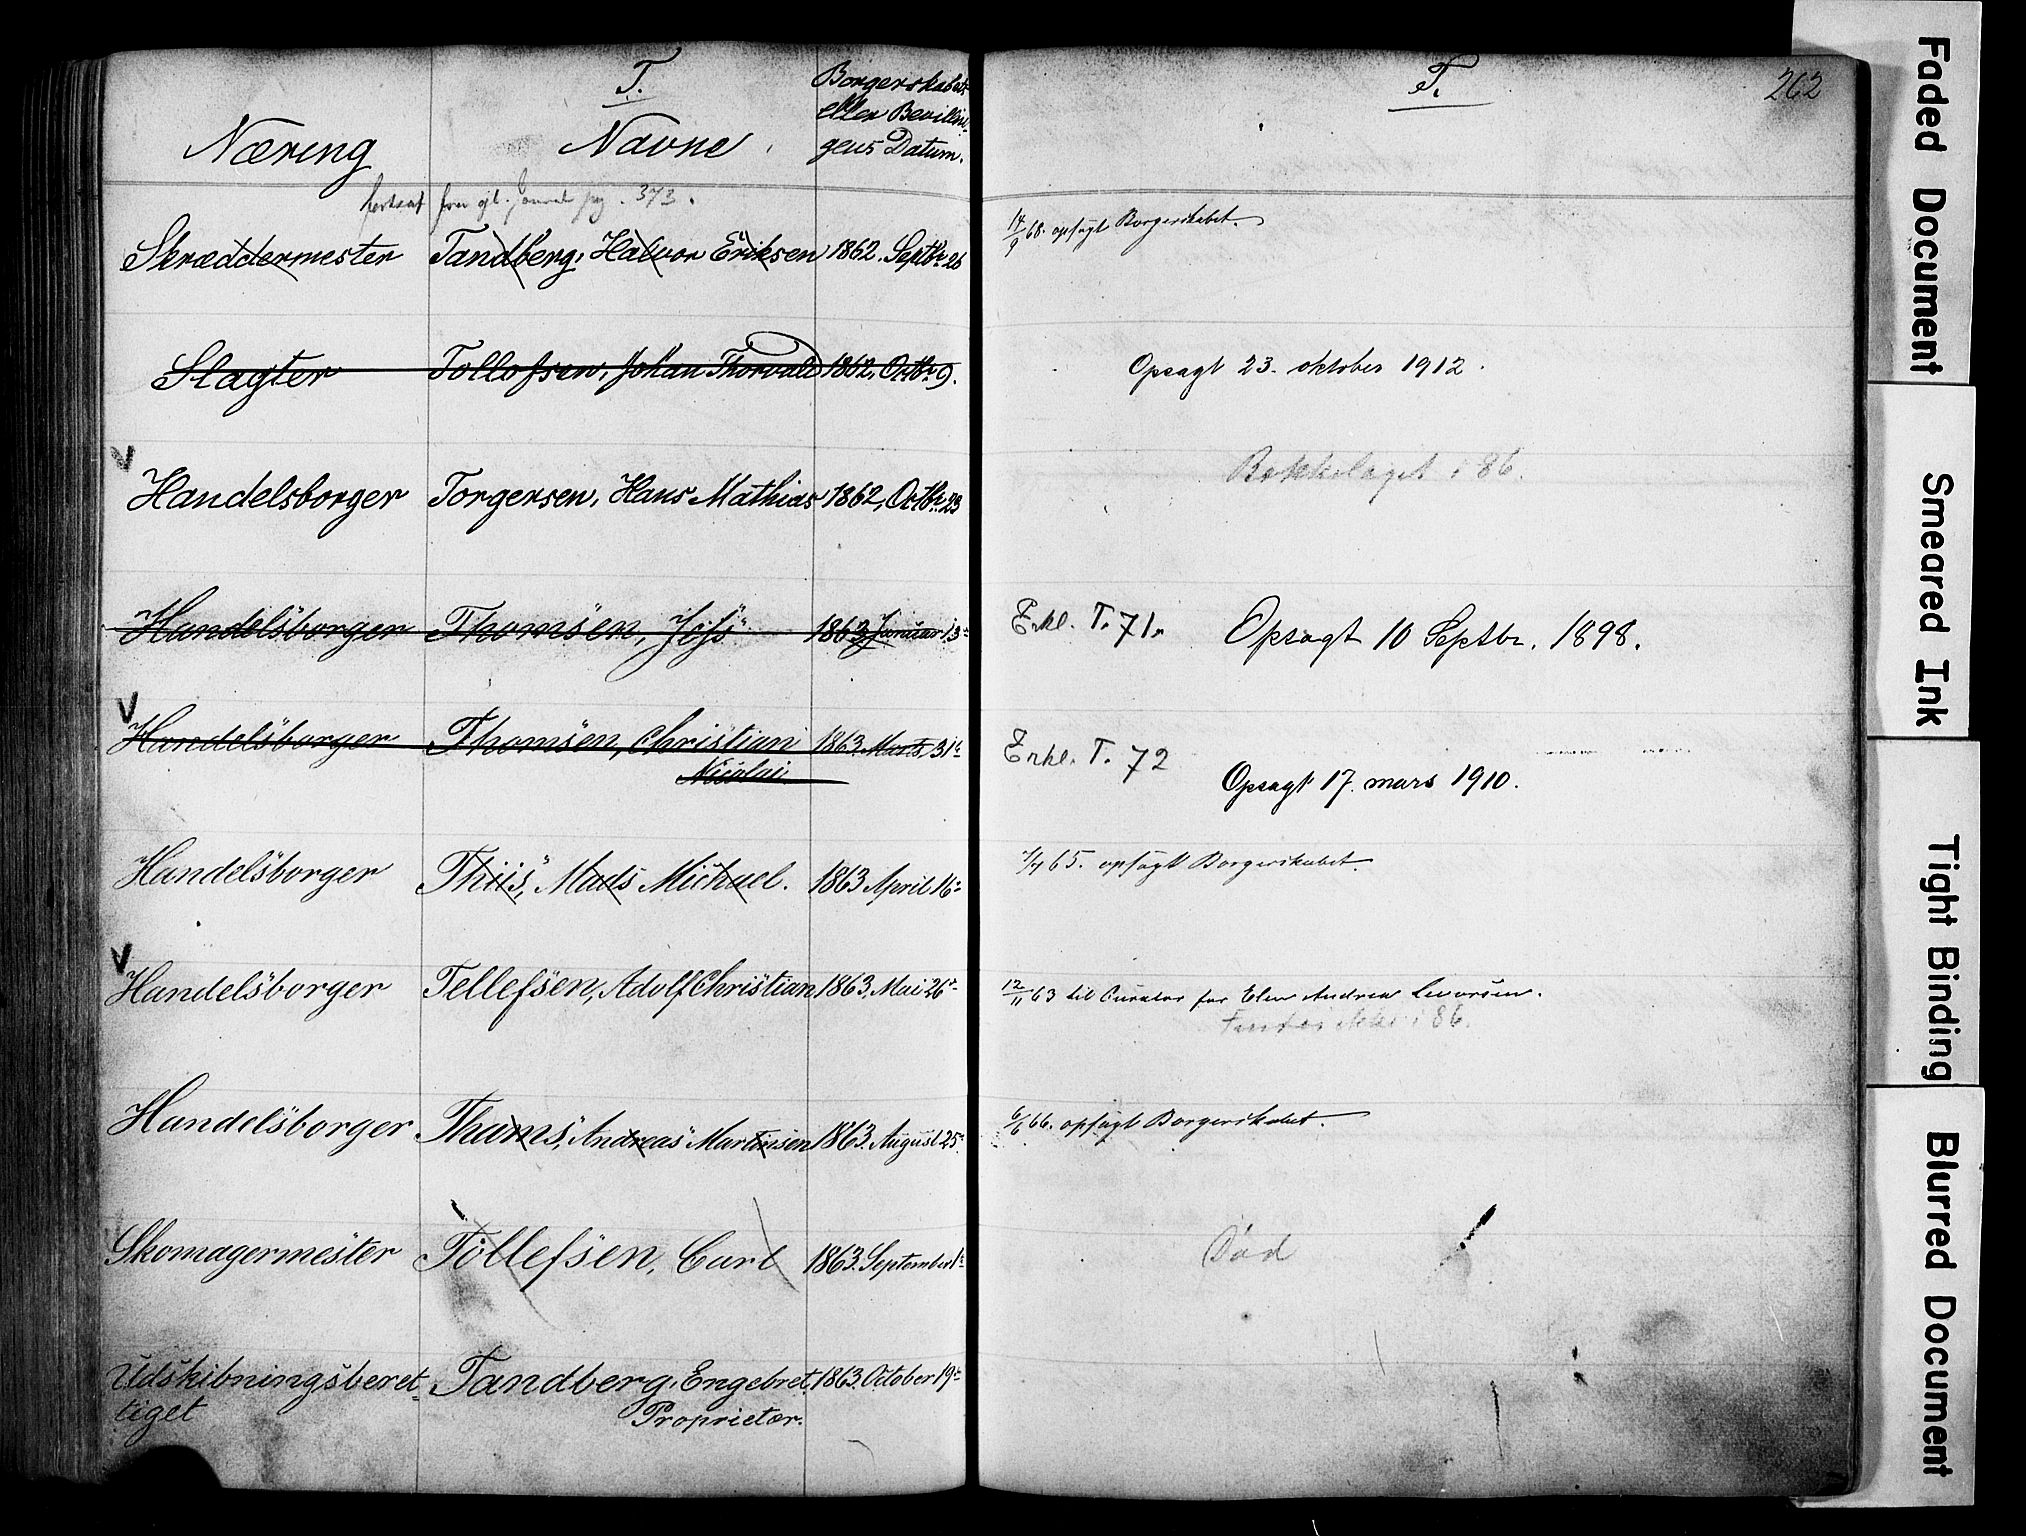 SAO, Kristiania magistrat, F/Fb/L0004: Borgerrulle, 1860-1879, s. 264